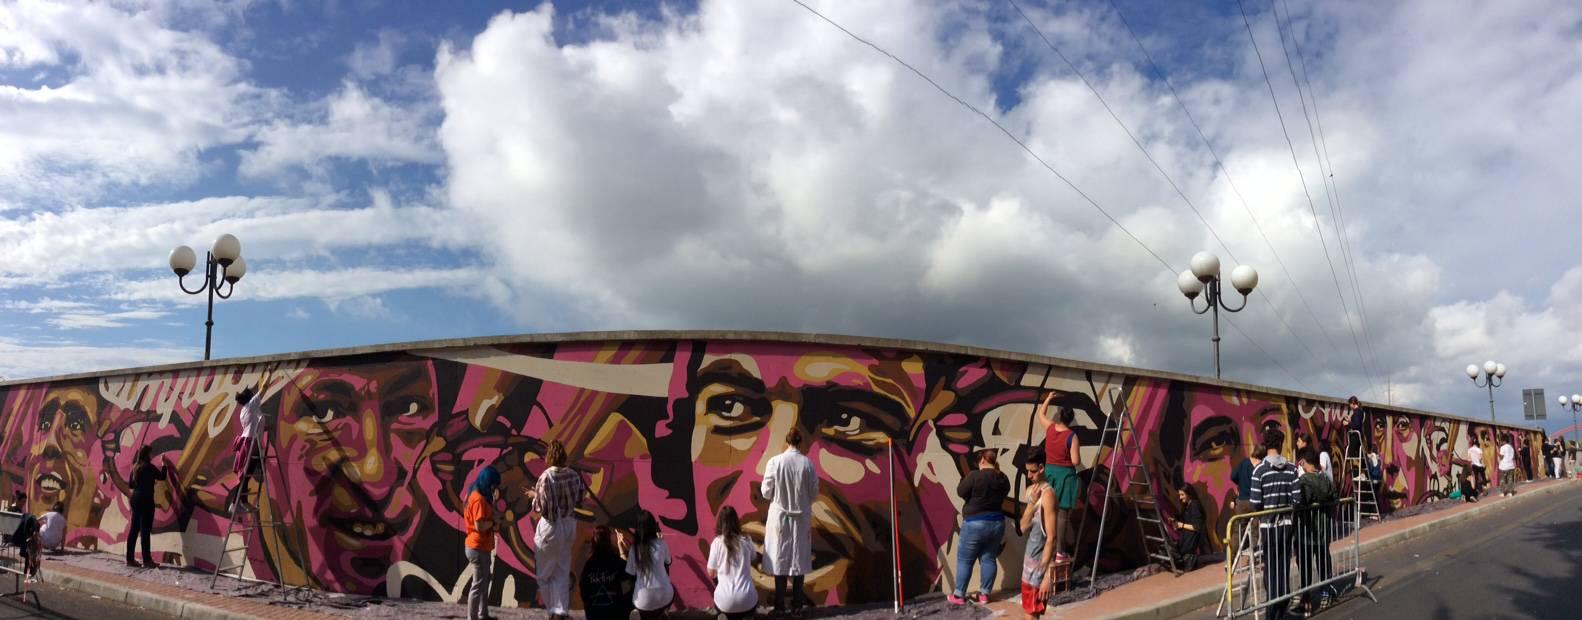 murales giro d'italia albenga